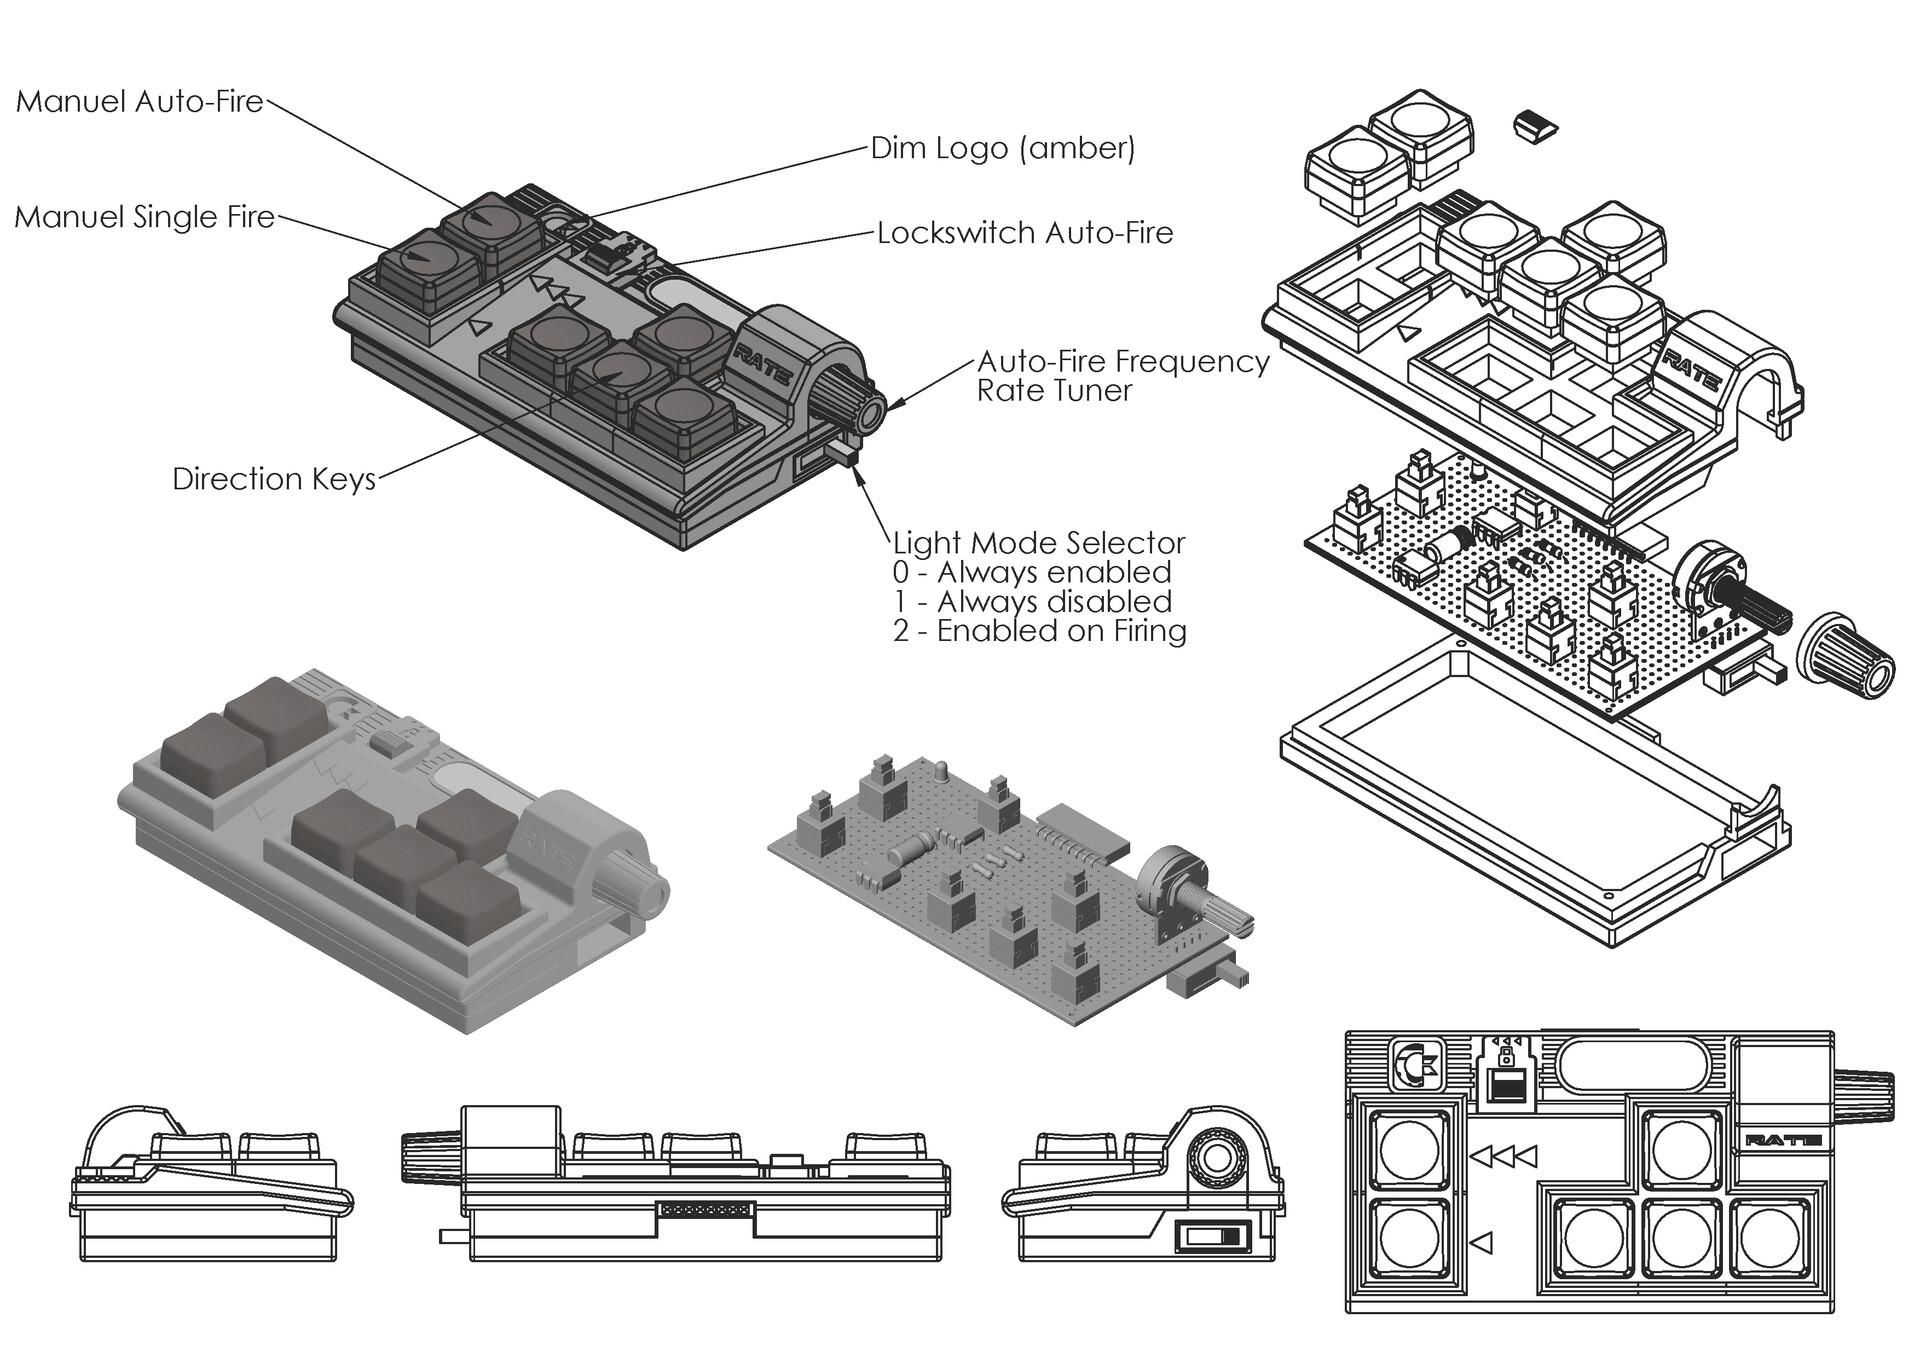 Cem tezcan joystick keypx r2 page 2